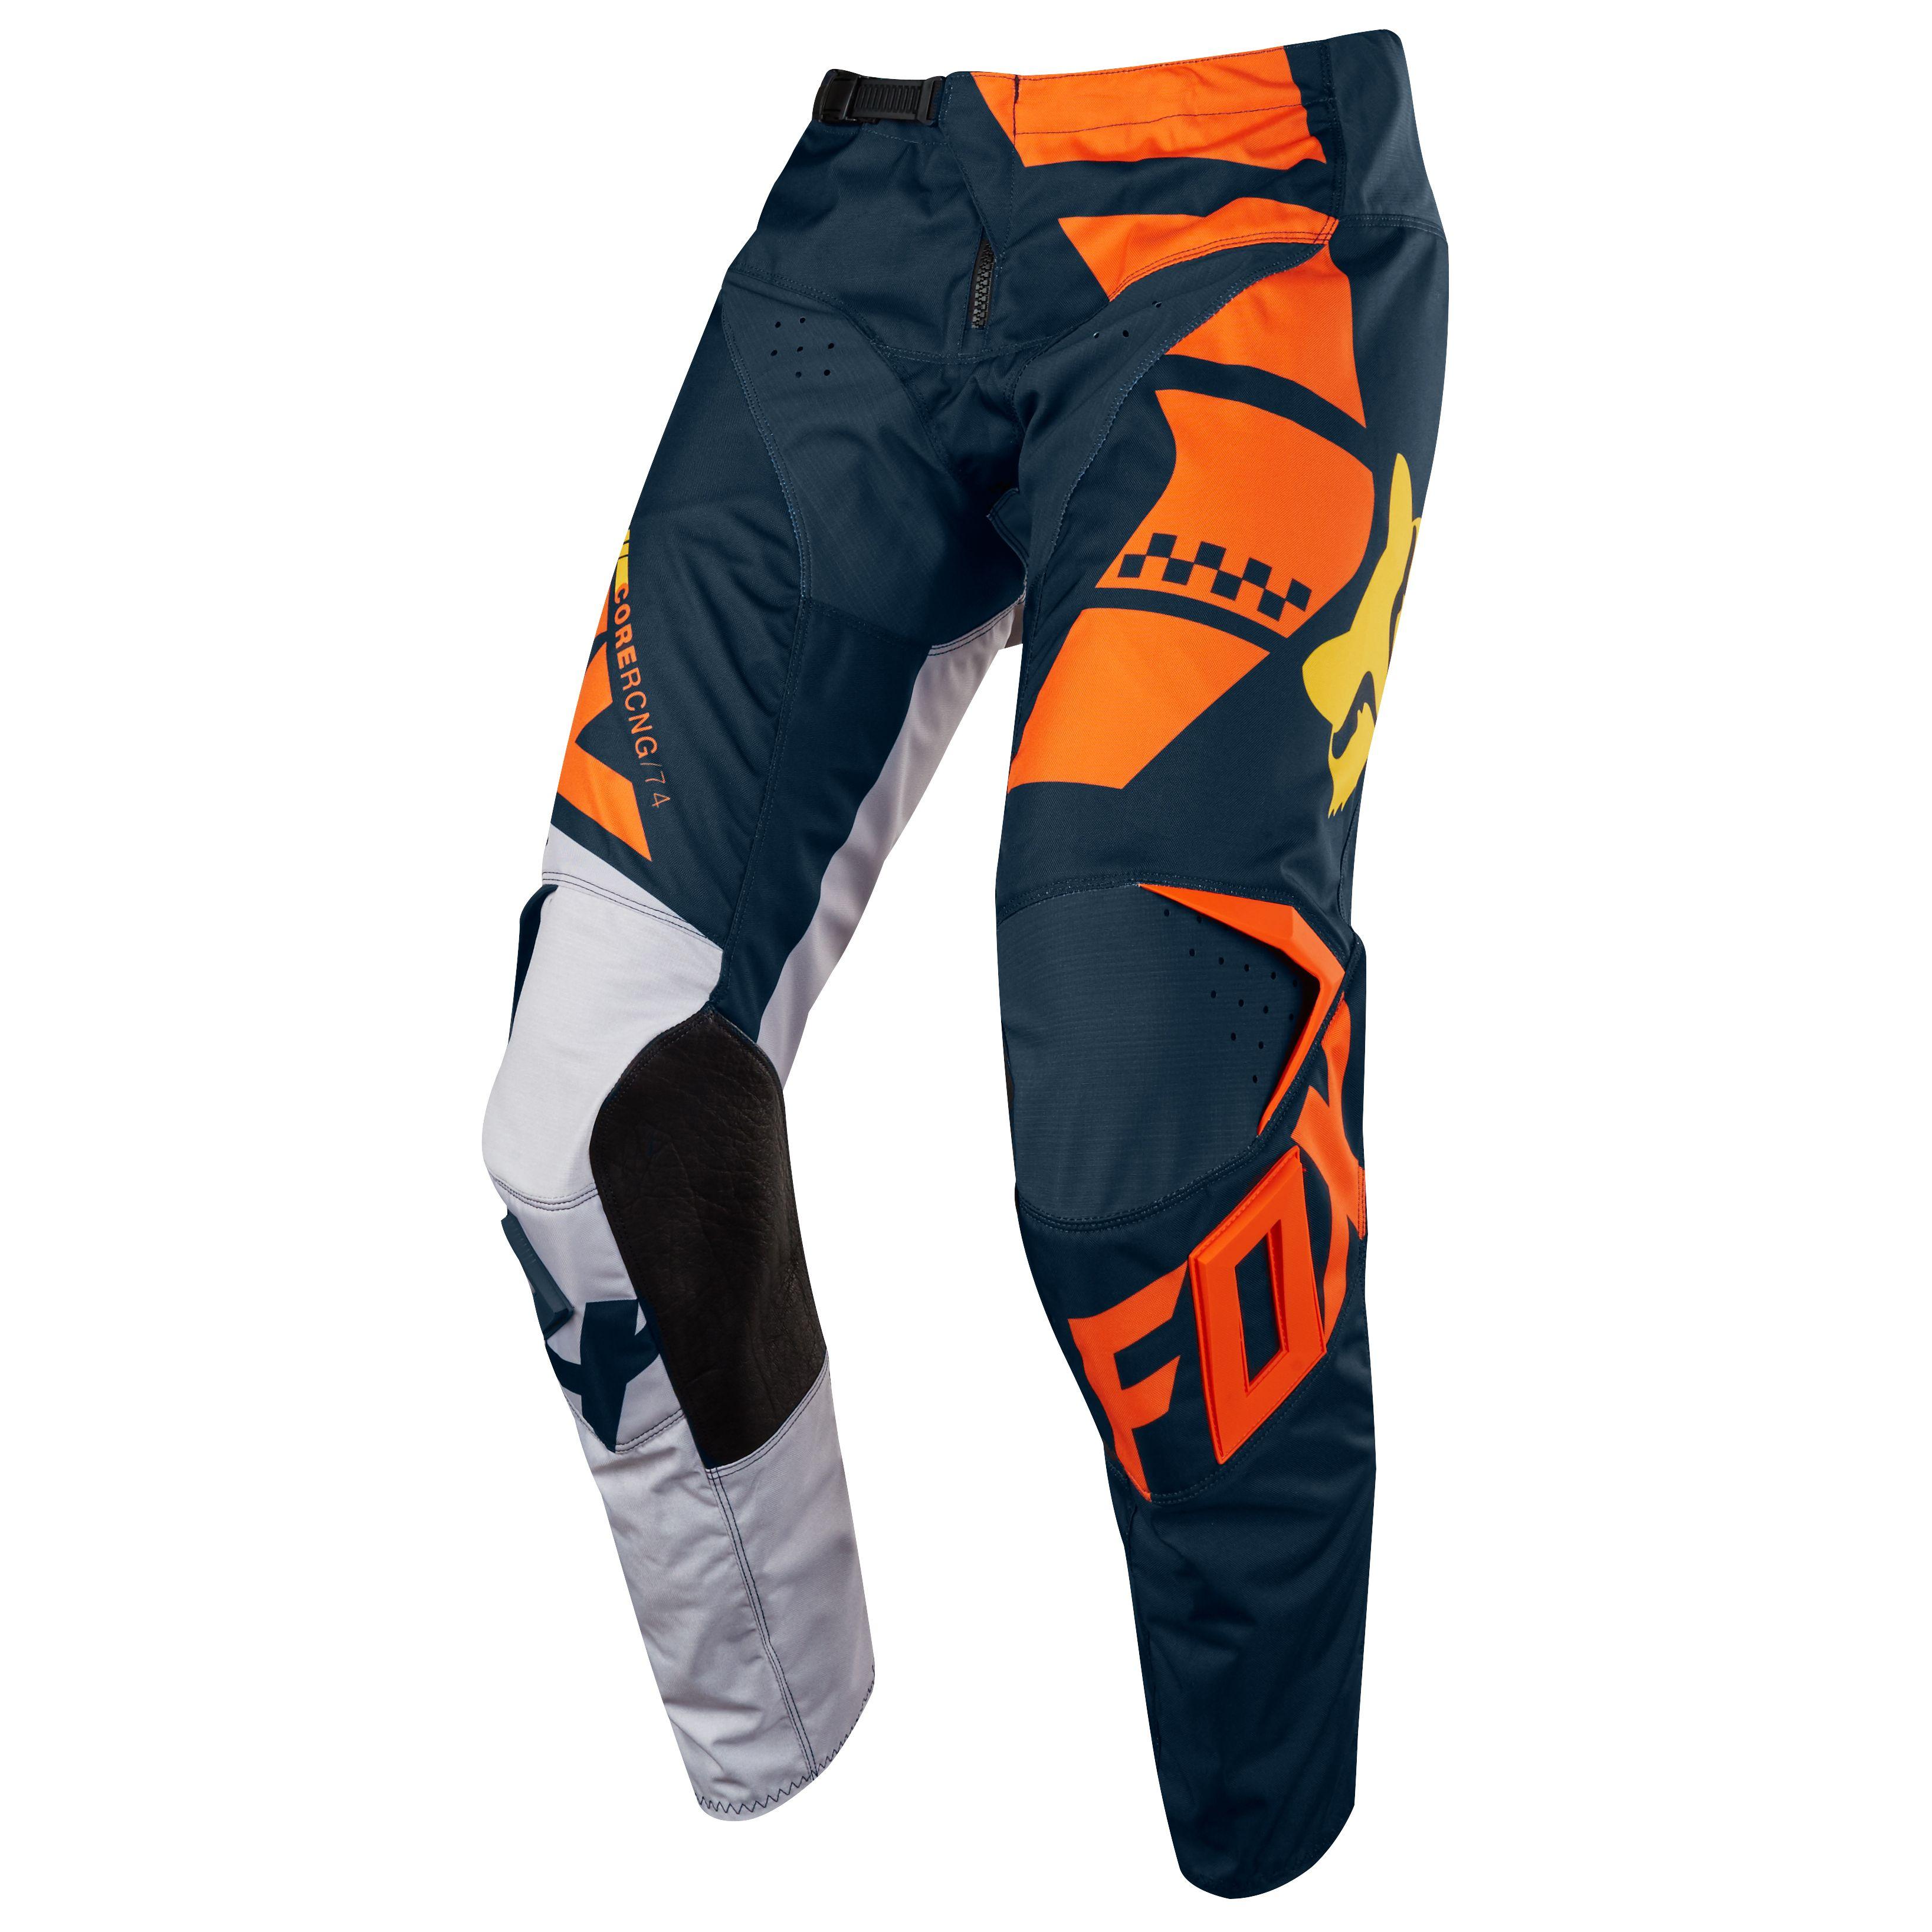 soldes pantalon cross fox 180 youth kid orange pilote tout terrain. Black Bedroom Furniture Sets. Home Design Ideas